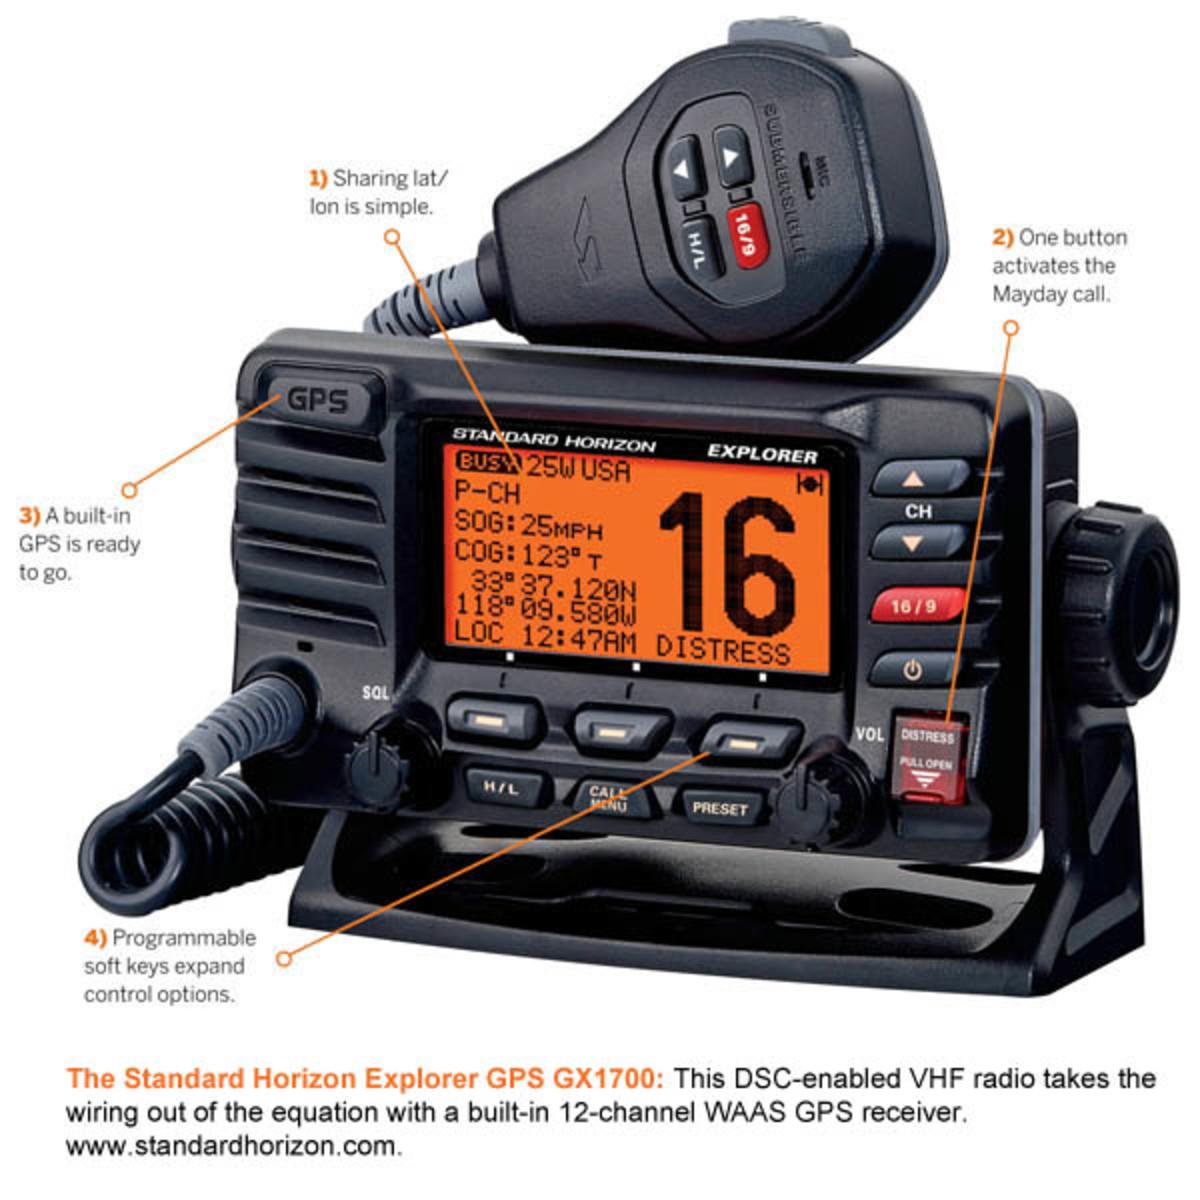 The Standard Horizon Explorer GPS GX1700